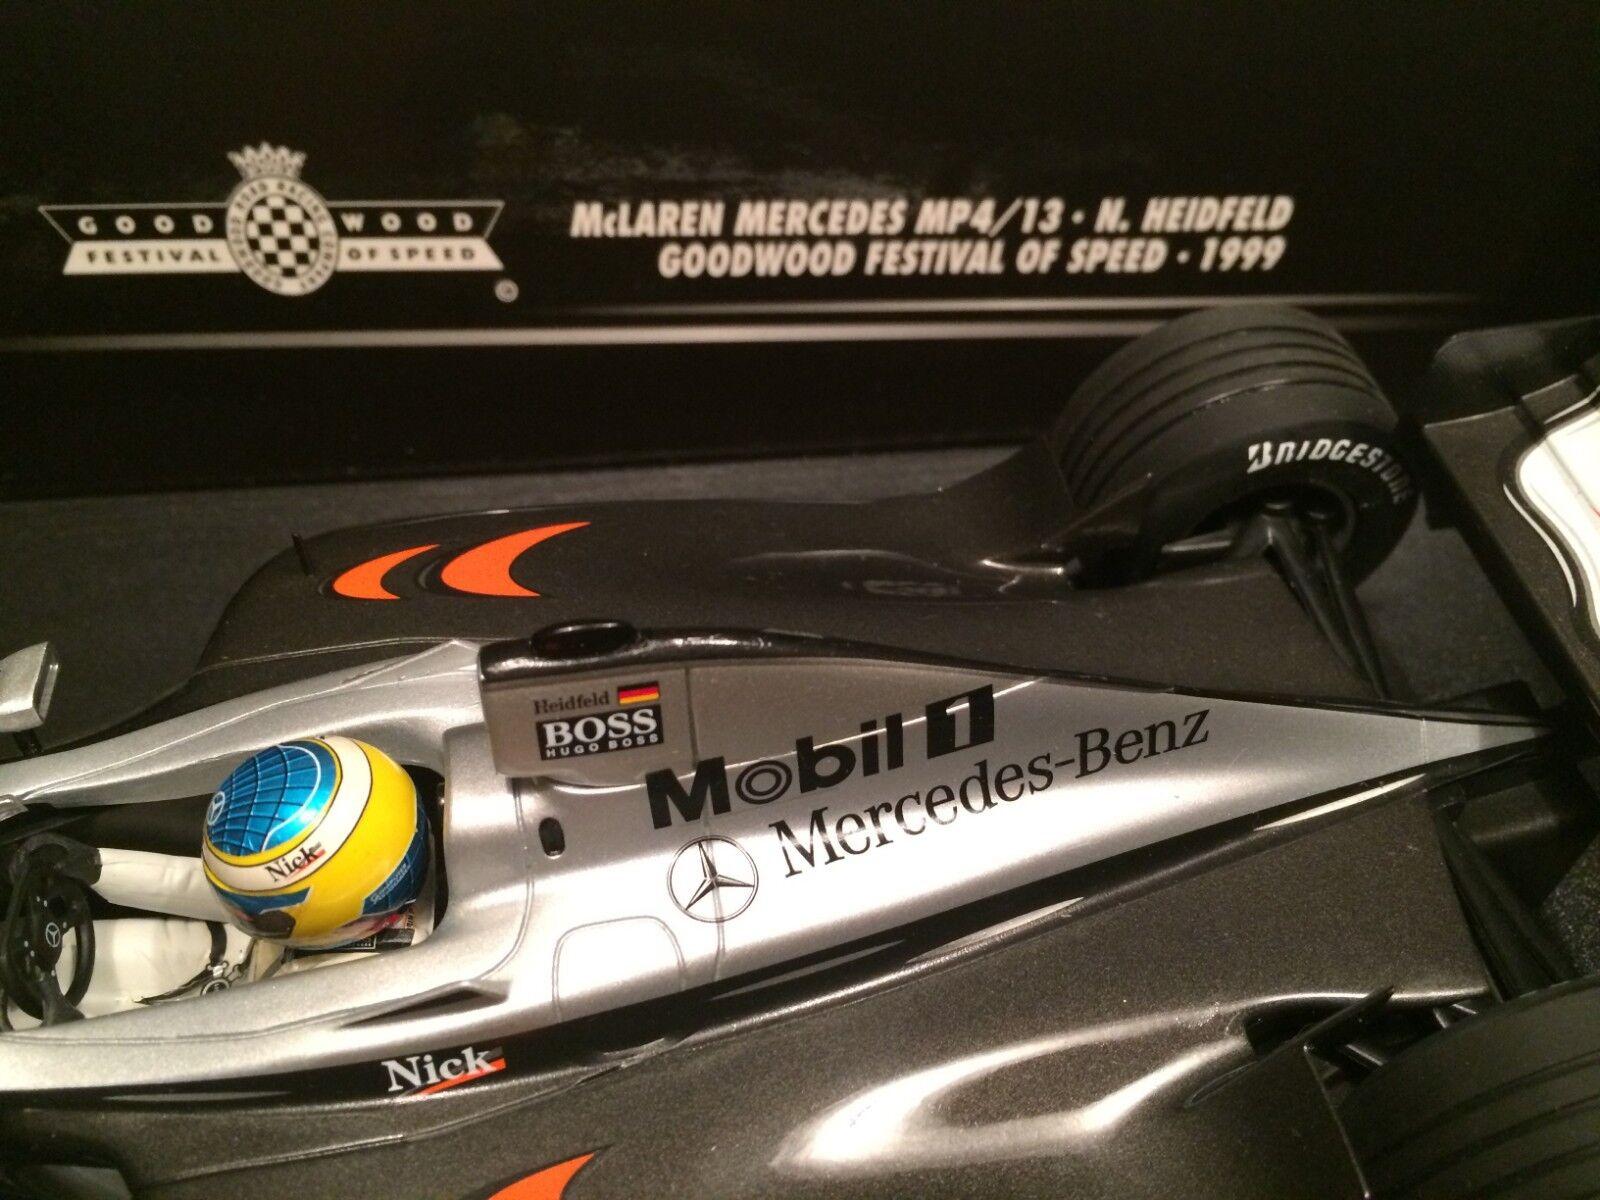 McLaren Mercedes MP4 13 Goodwood Goodwood Goodwood Festival of Speed Minichamps 991899 1 18 scale f56eb4